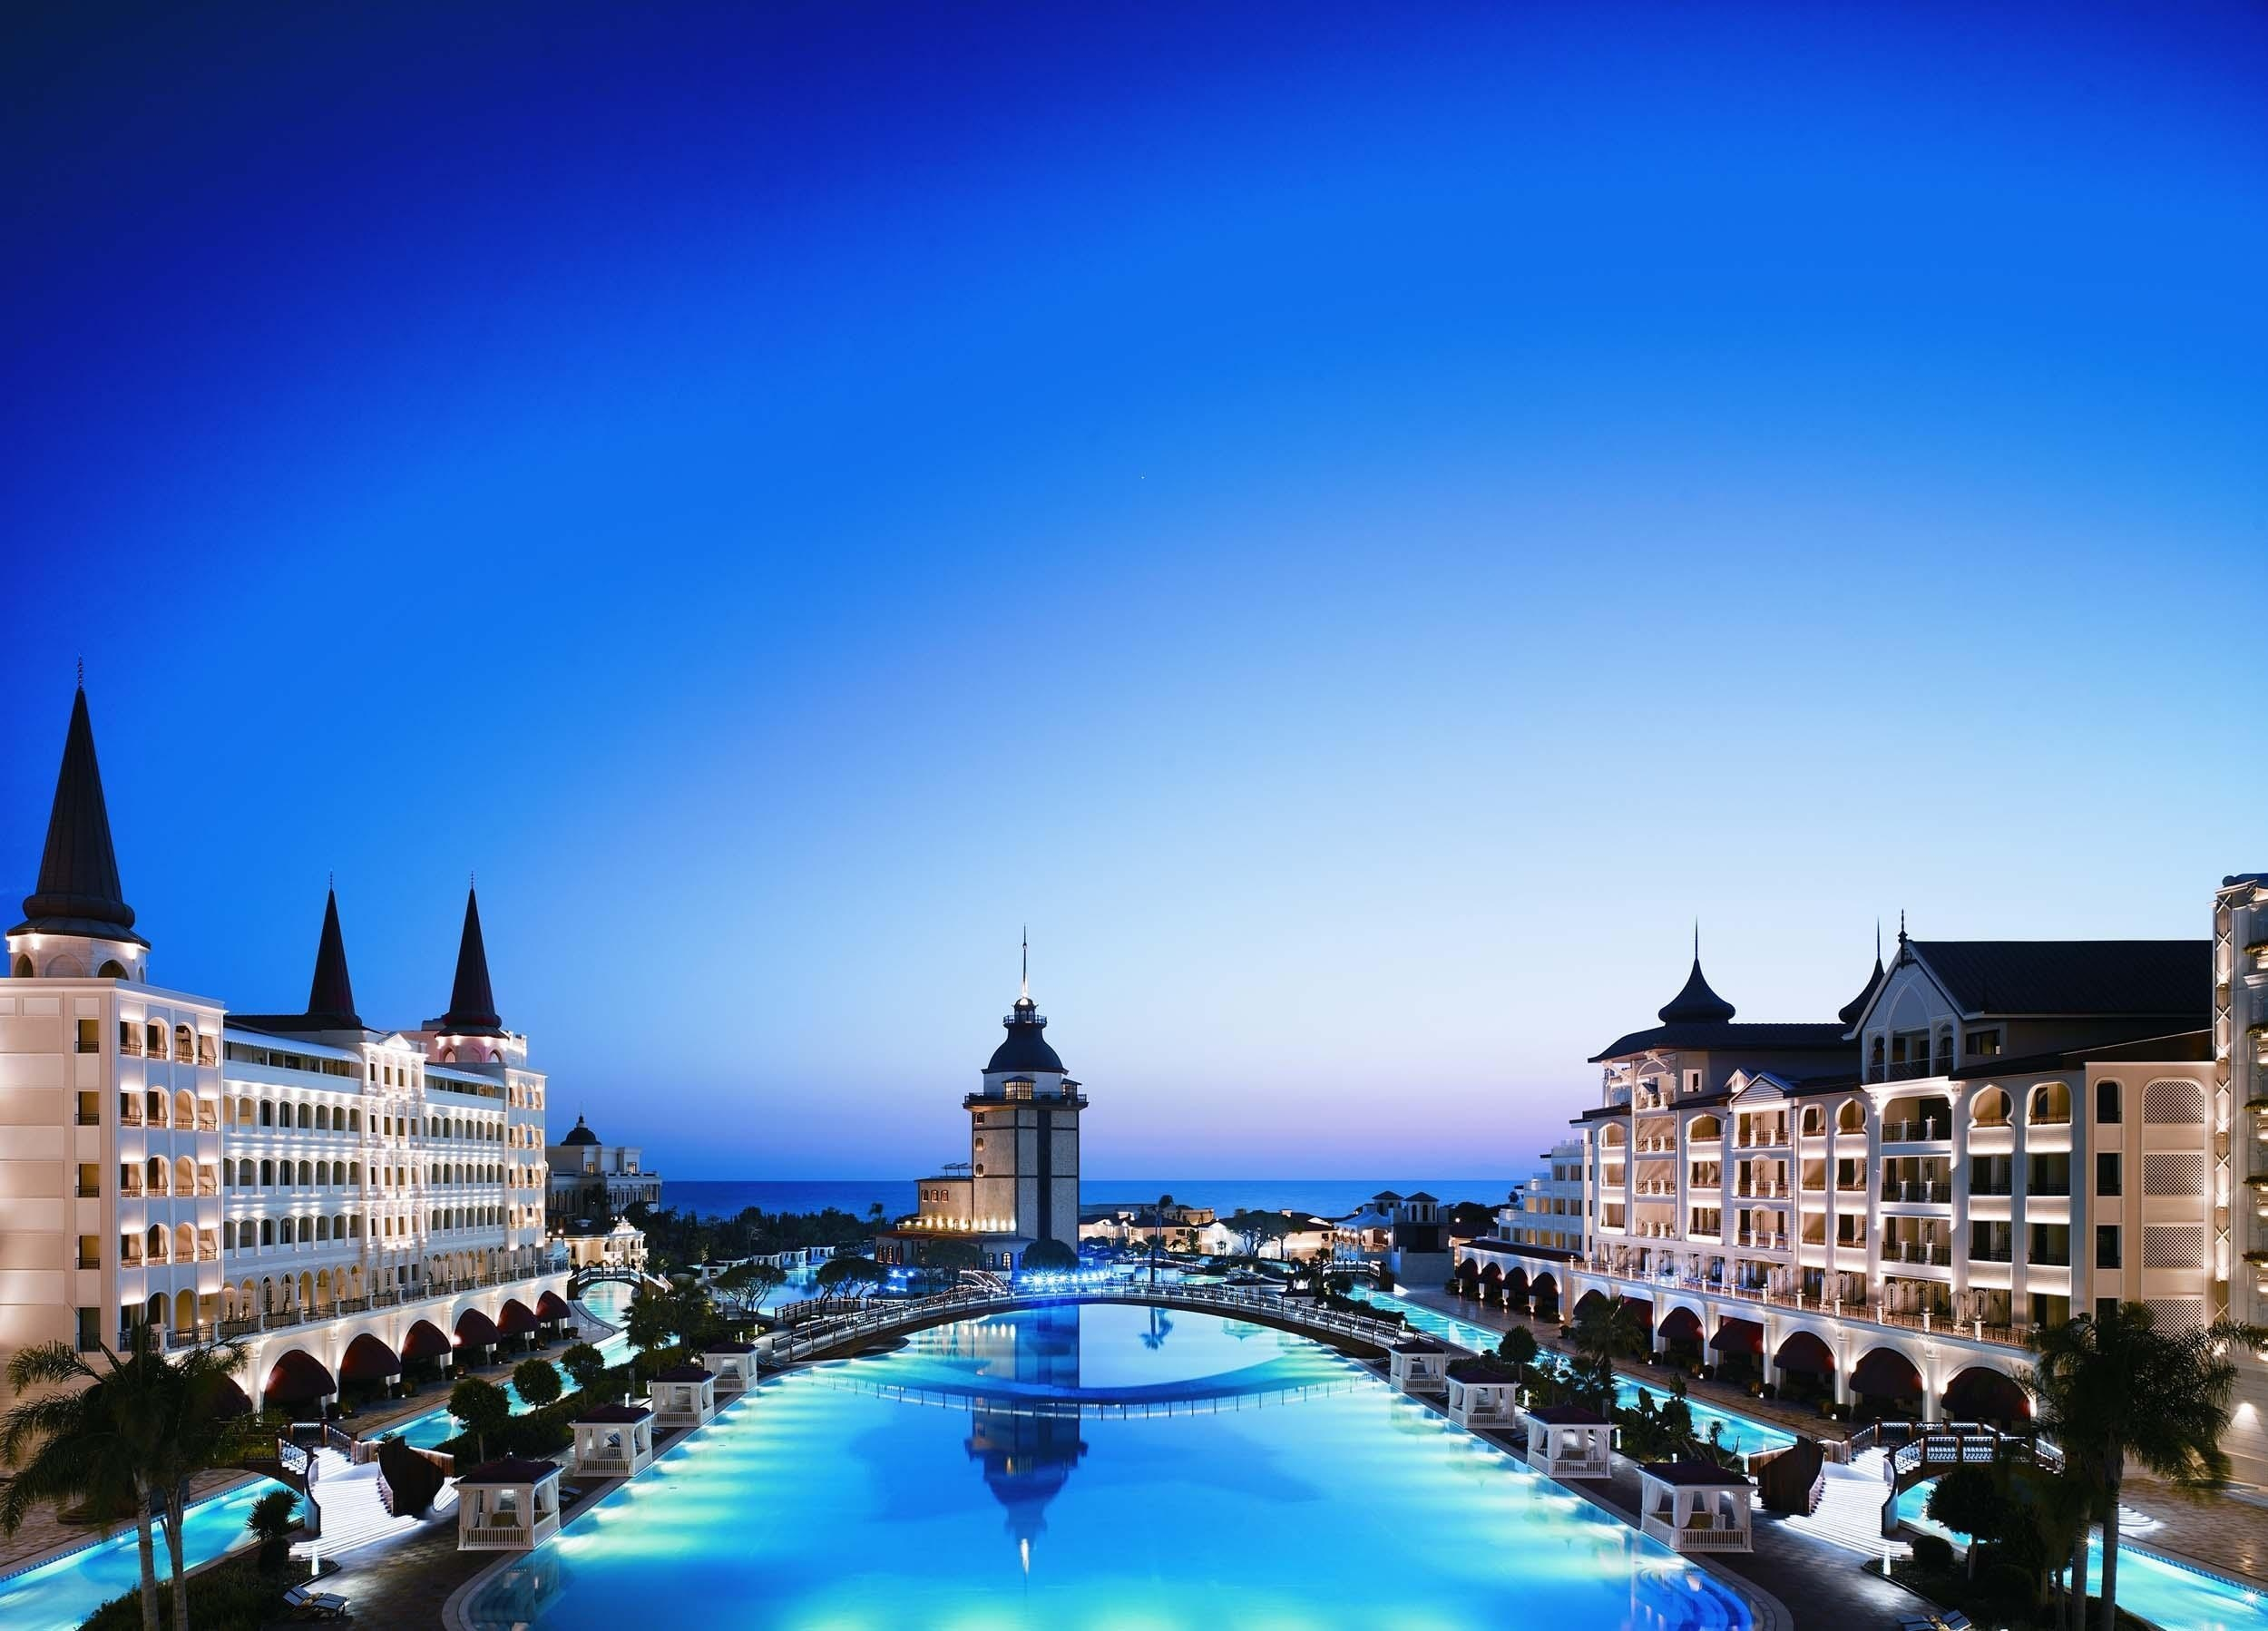 The Mardan Palace Is A Luxury Hotel In Lara Antalya Turkey Hd